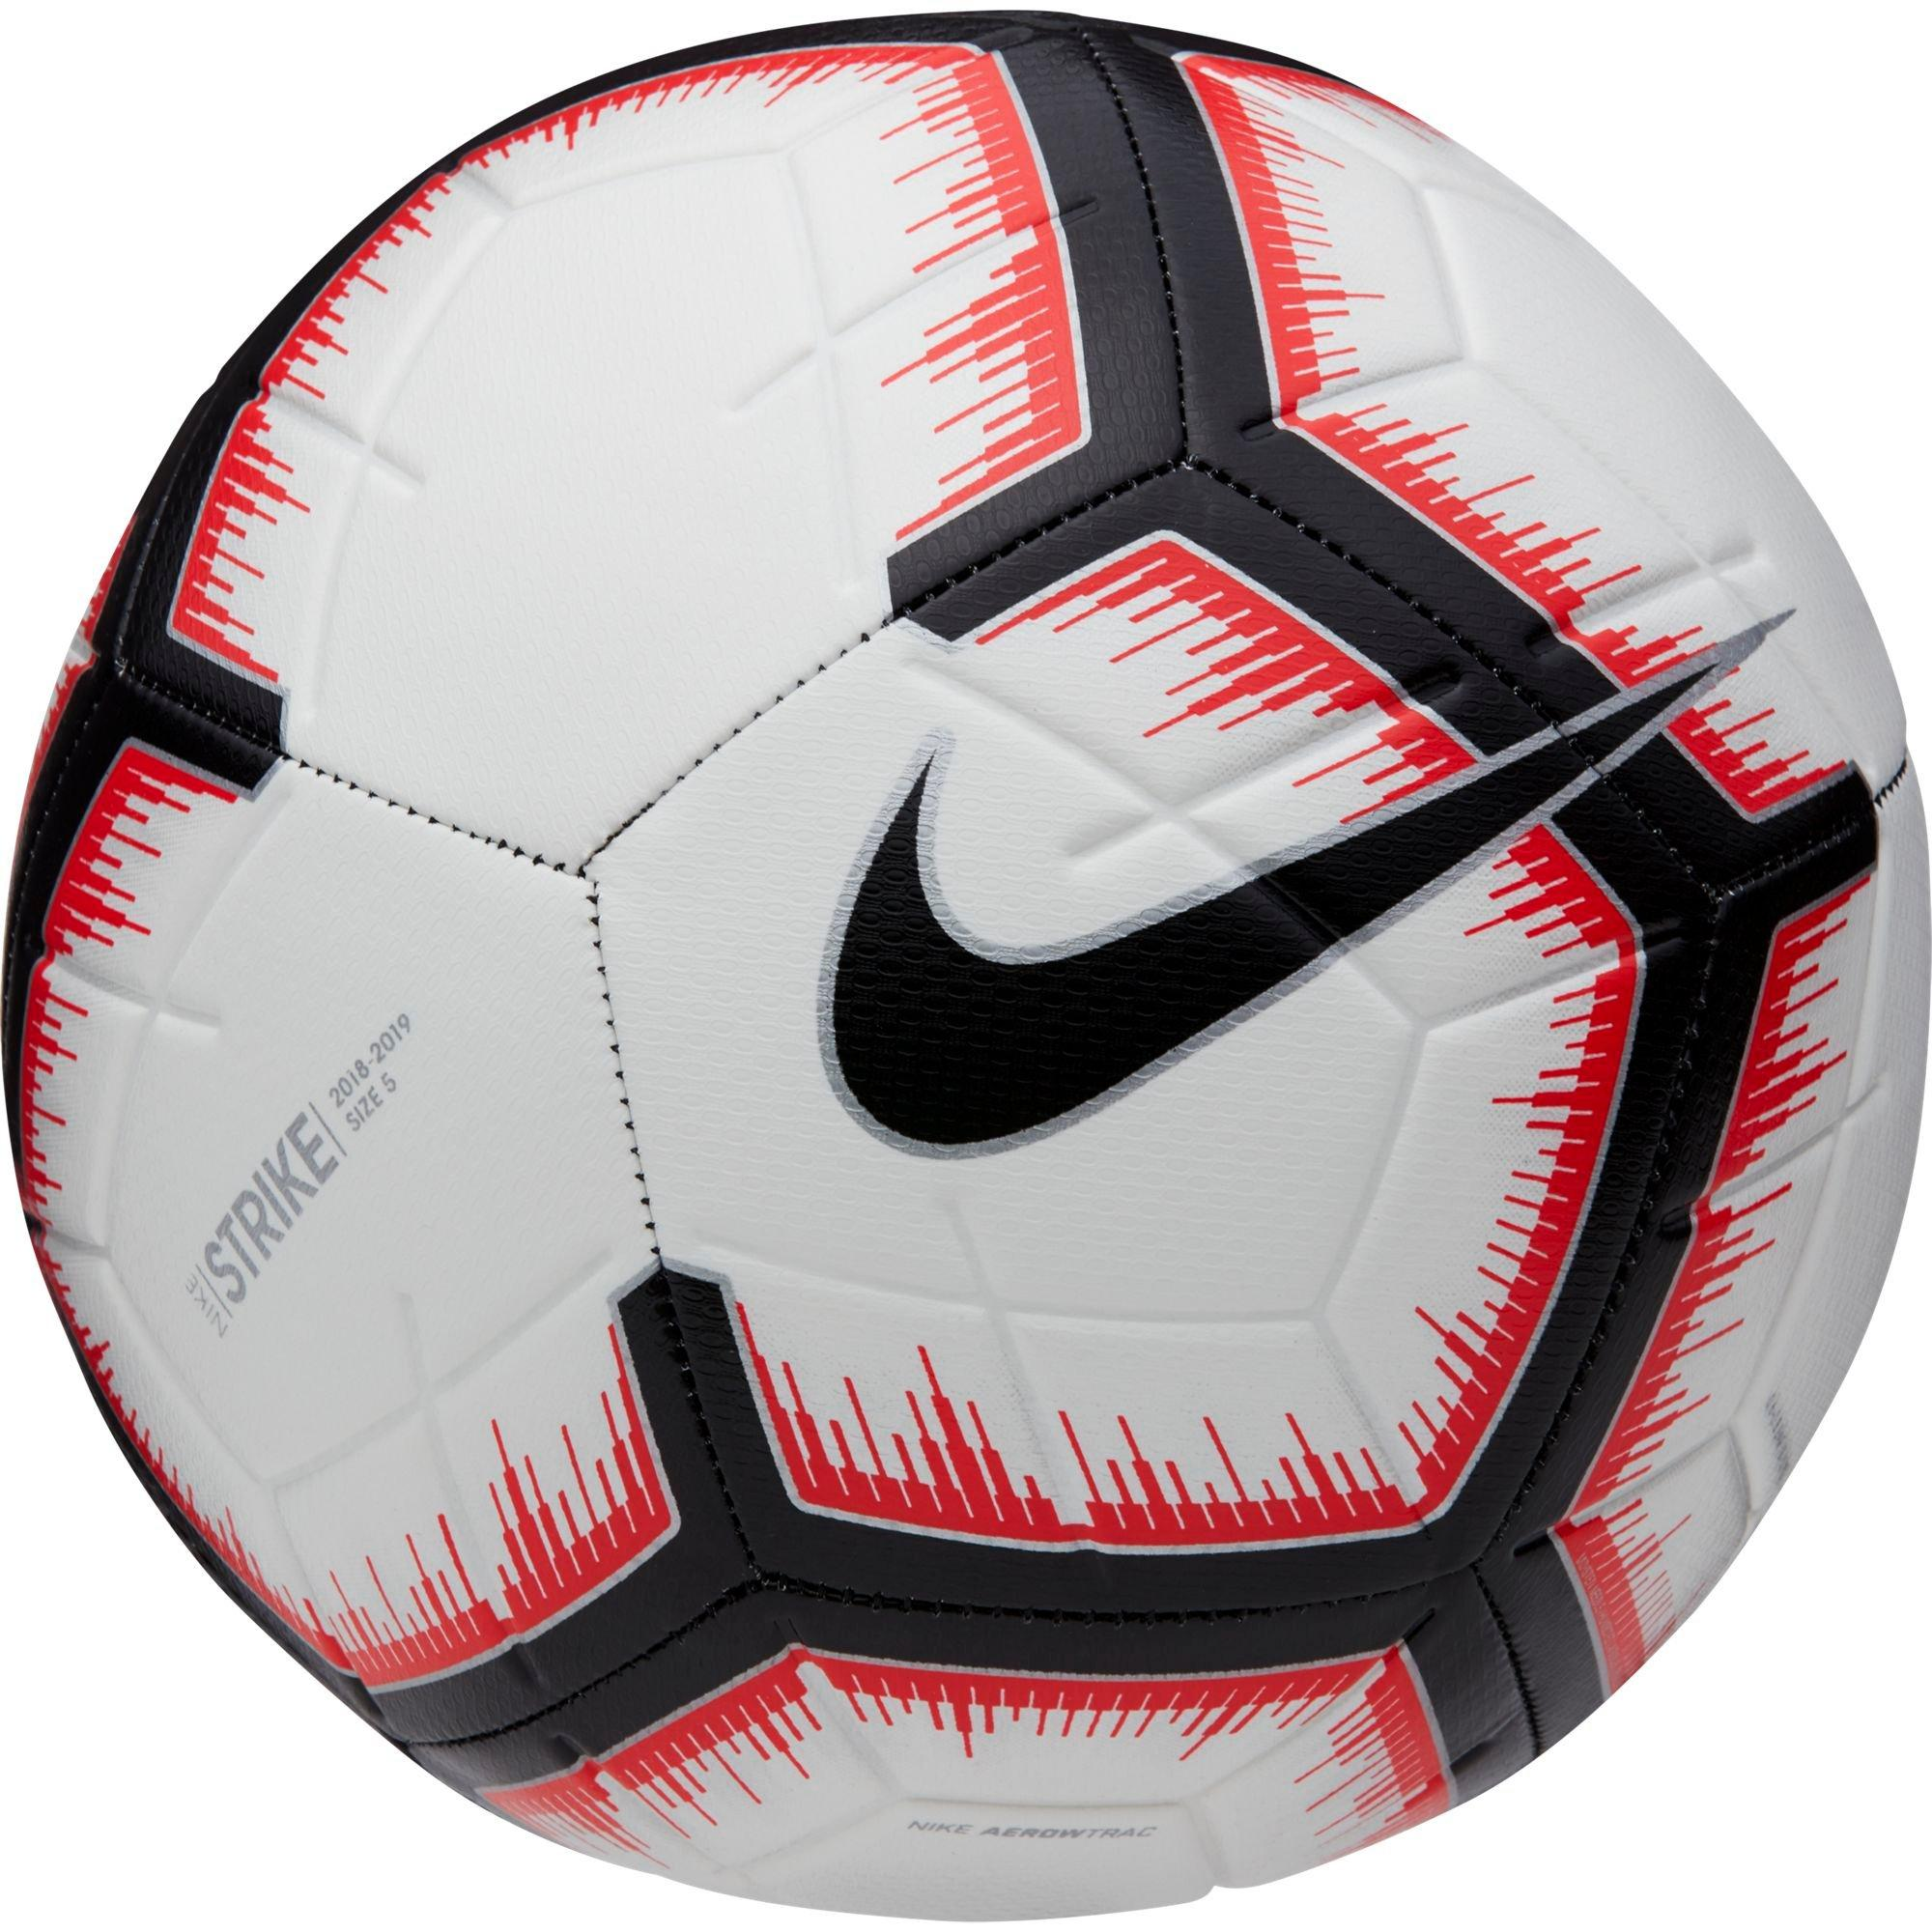 bicicleta negro Certificado  Nike Strike Size 5 Soccer Ball - Hibbett   City Gear